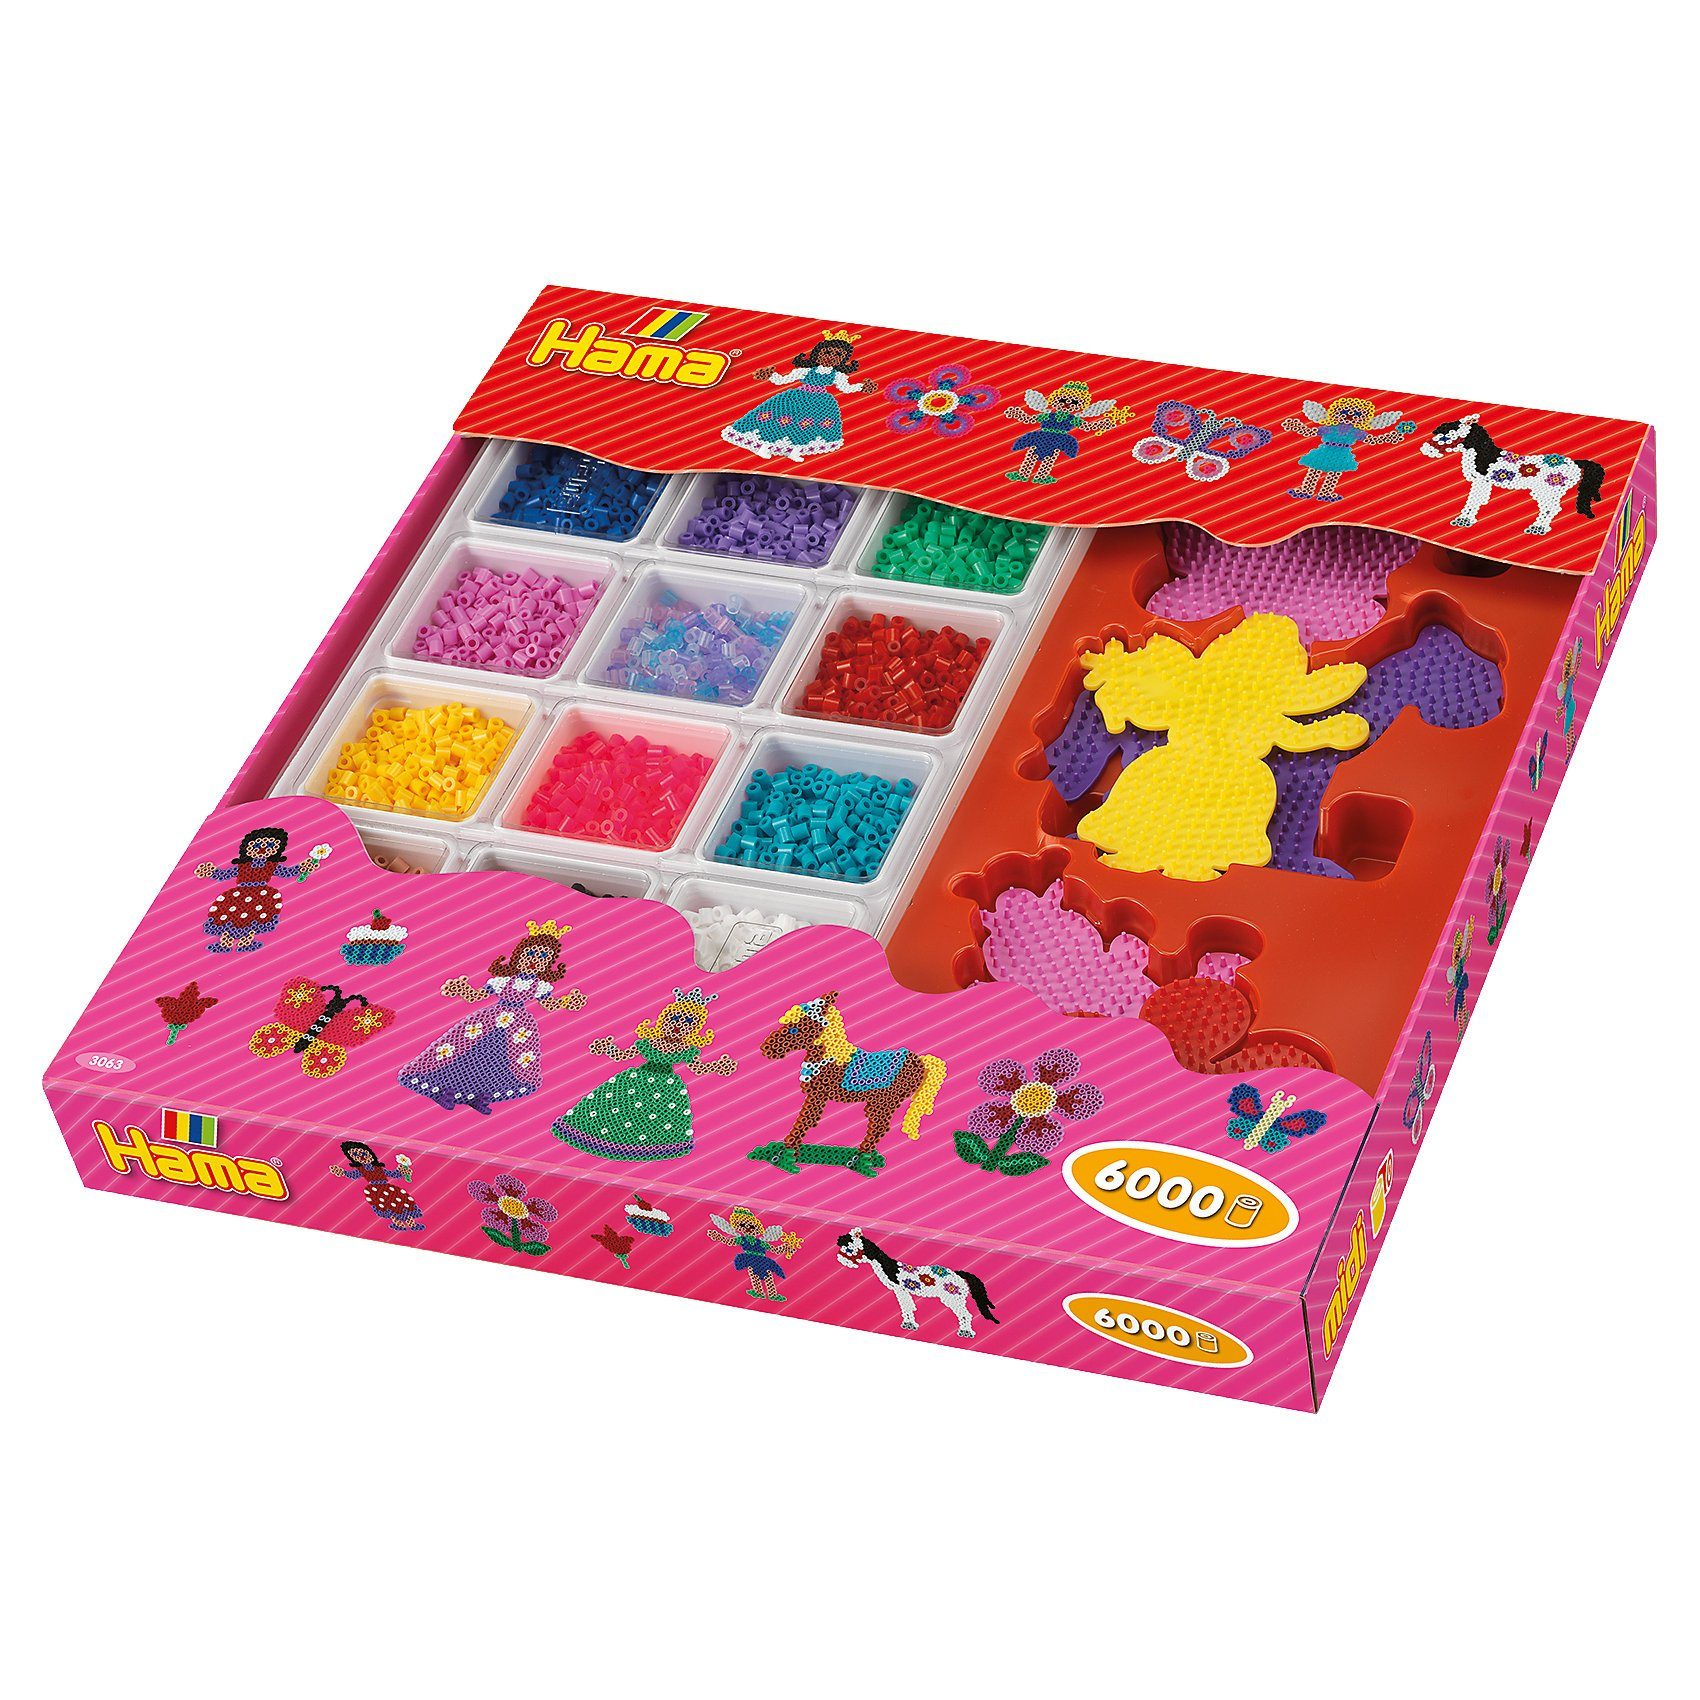 Hama Perlen HAMA 3063 Super Geschenkset pink, 6.000 midi-Perlen & Zubehö